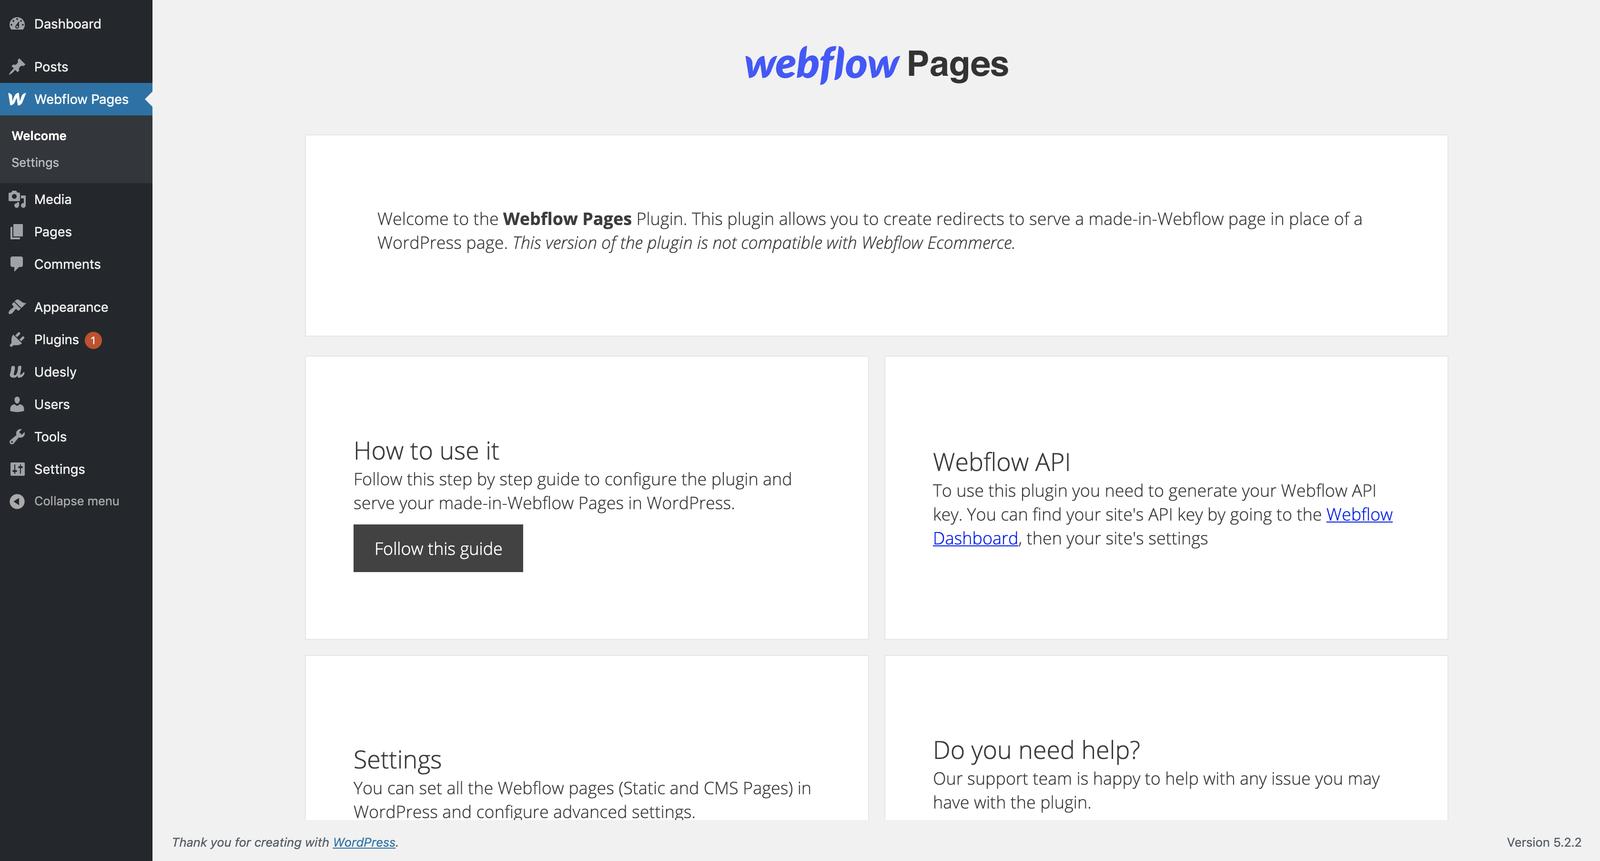 Webflow Pages WordPress plugin